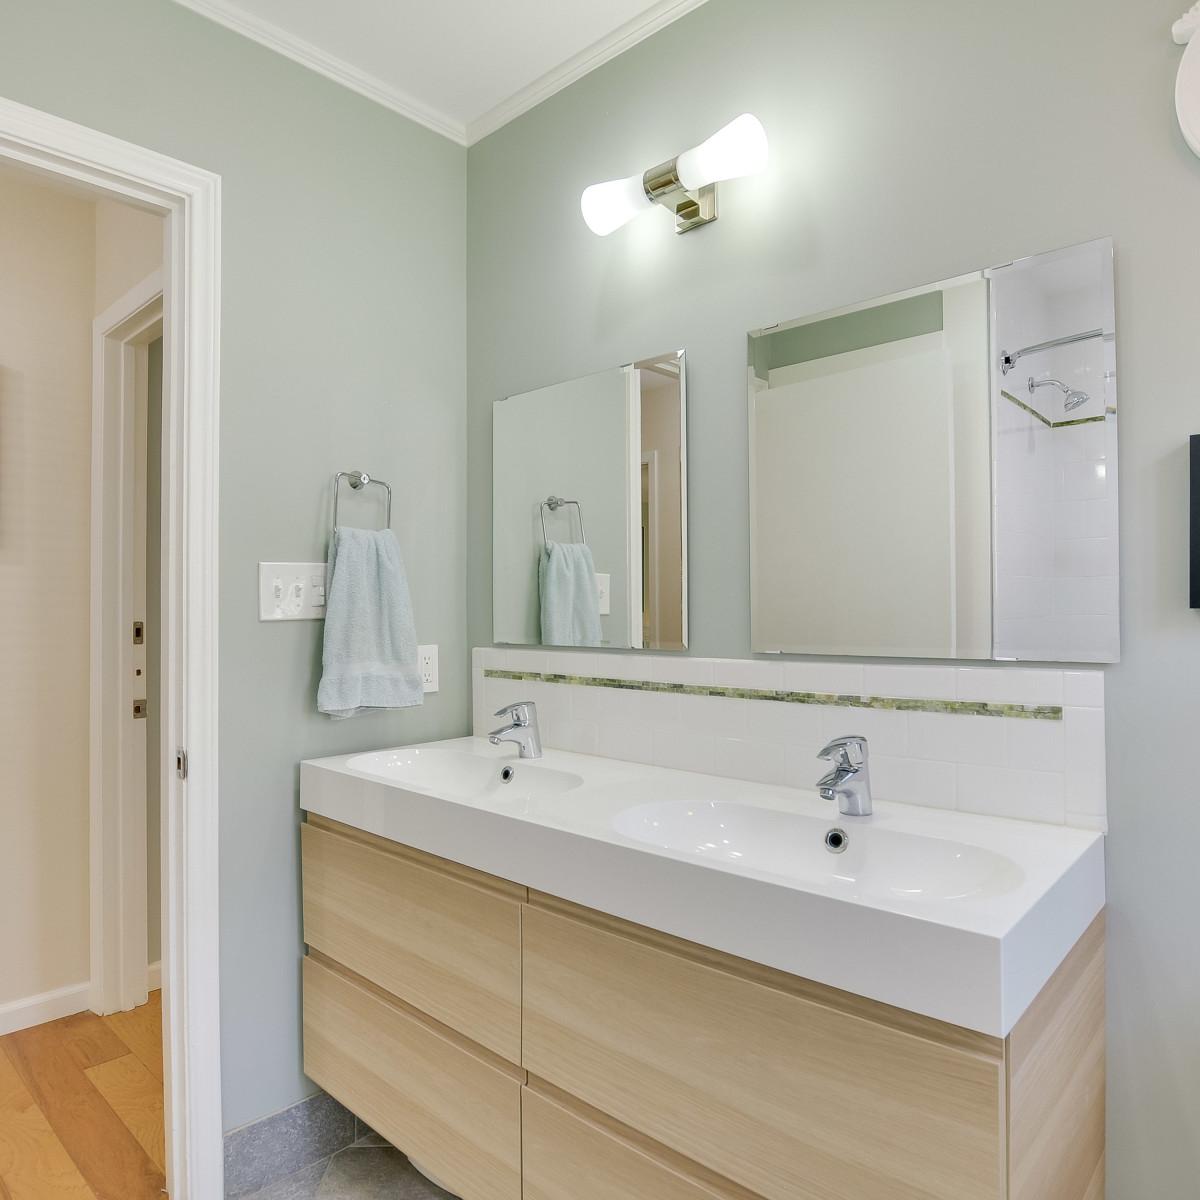 231 Hillview San Antonio house for sale bathroom